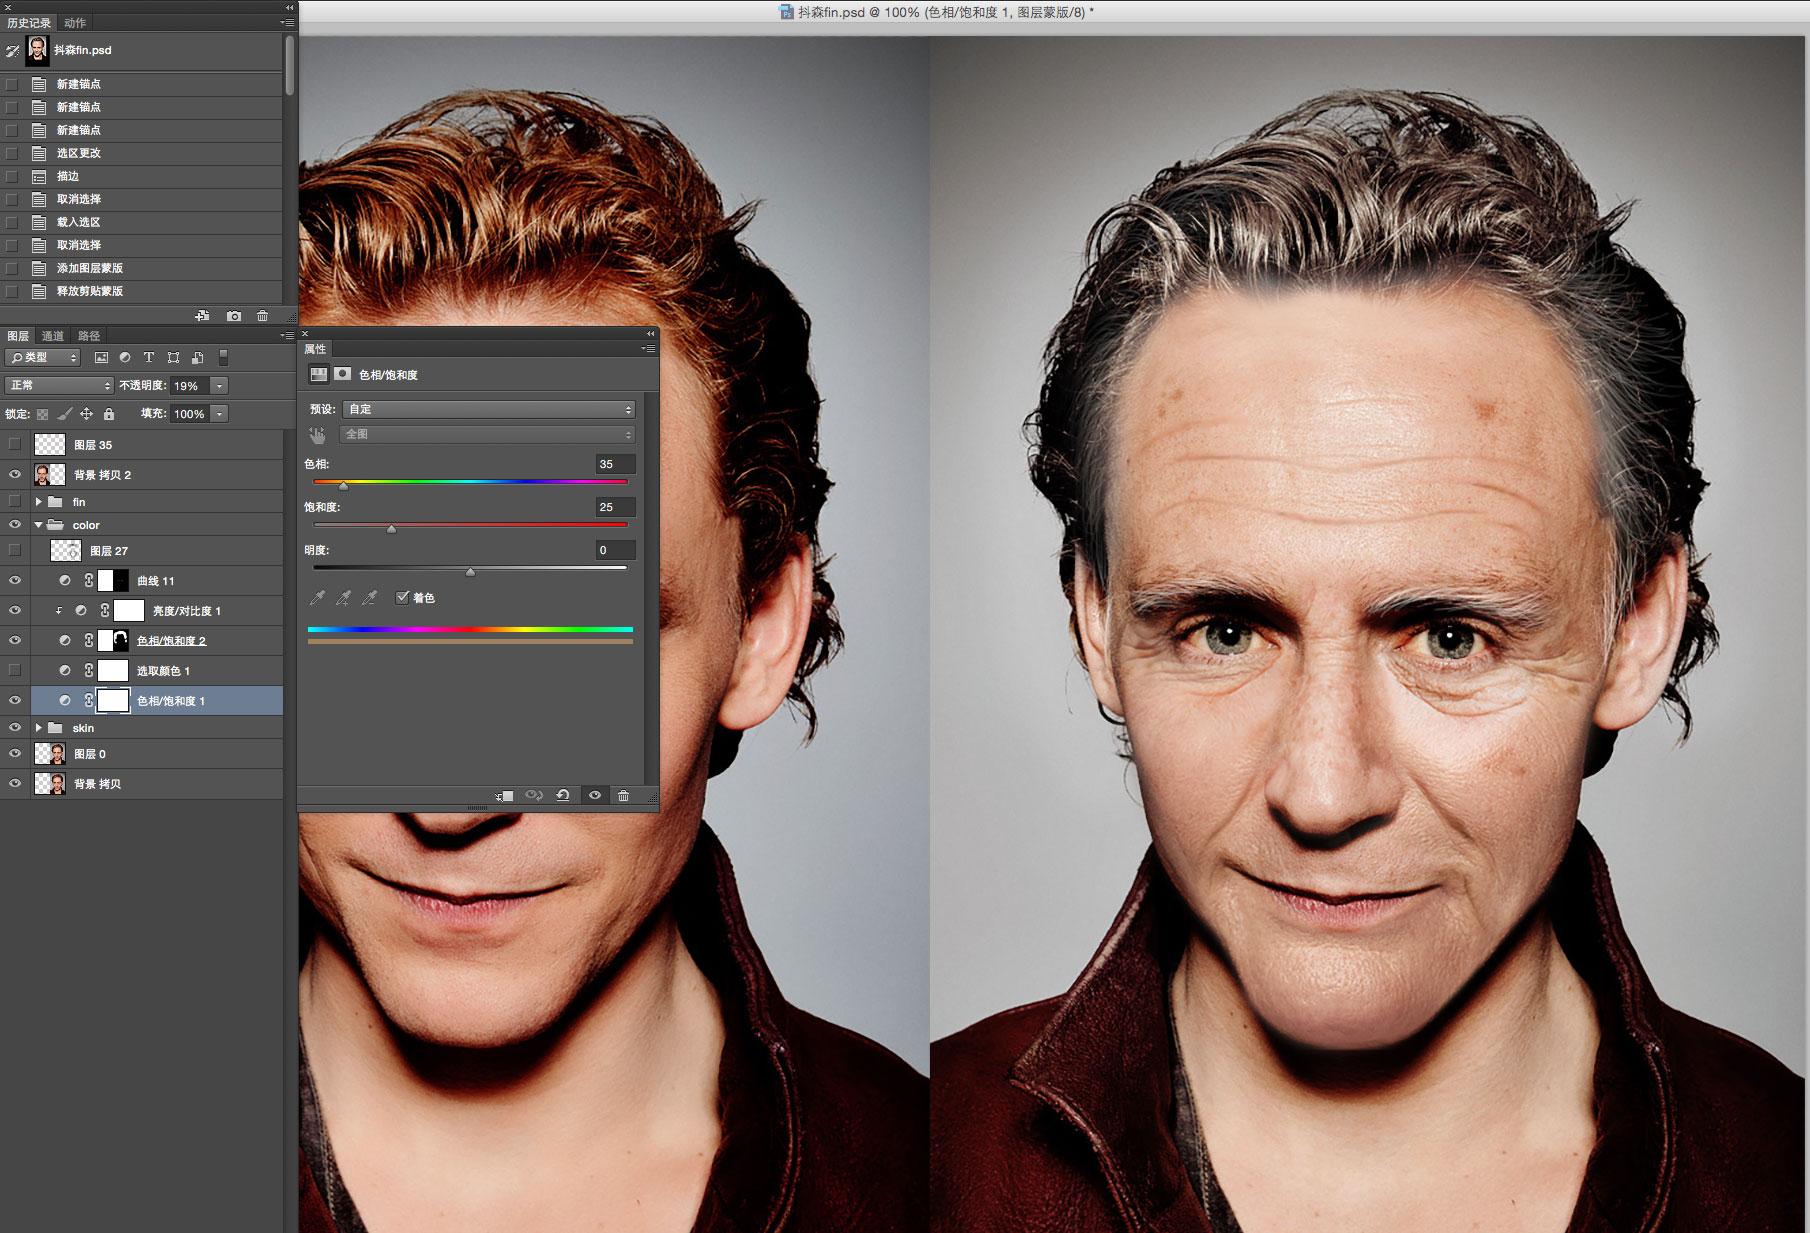 PS高手教程!用Photoshop把抖森变老的后期修图大法